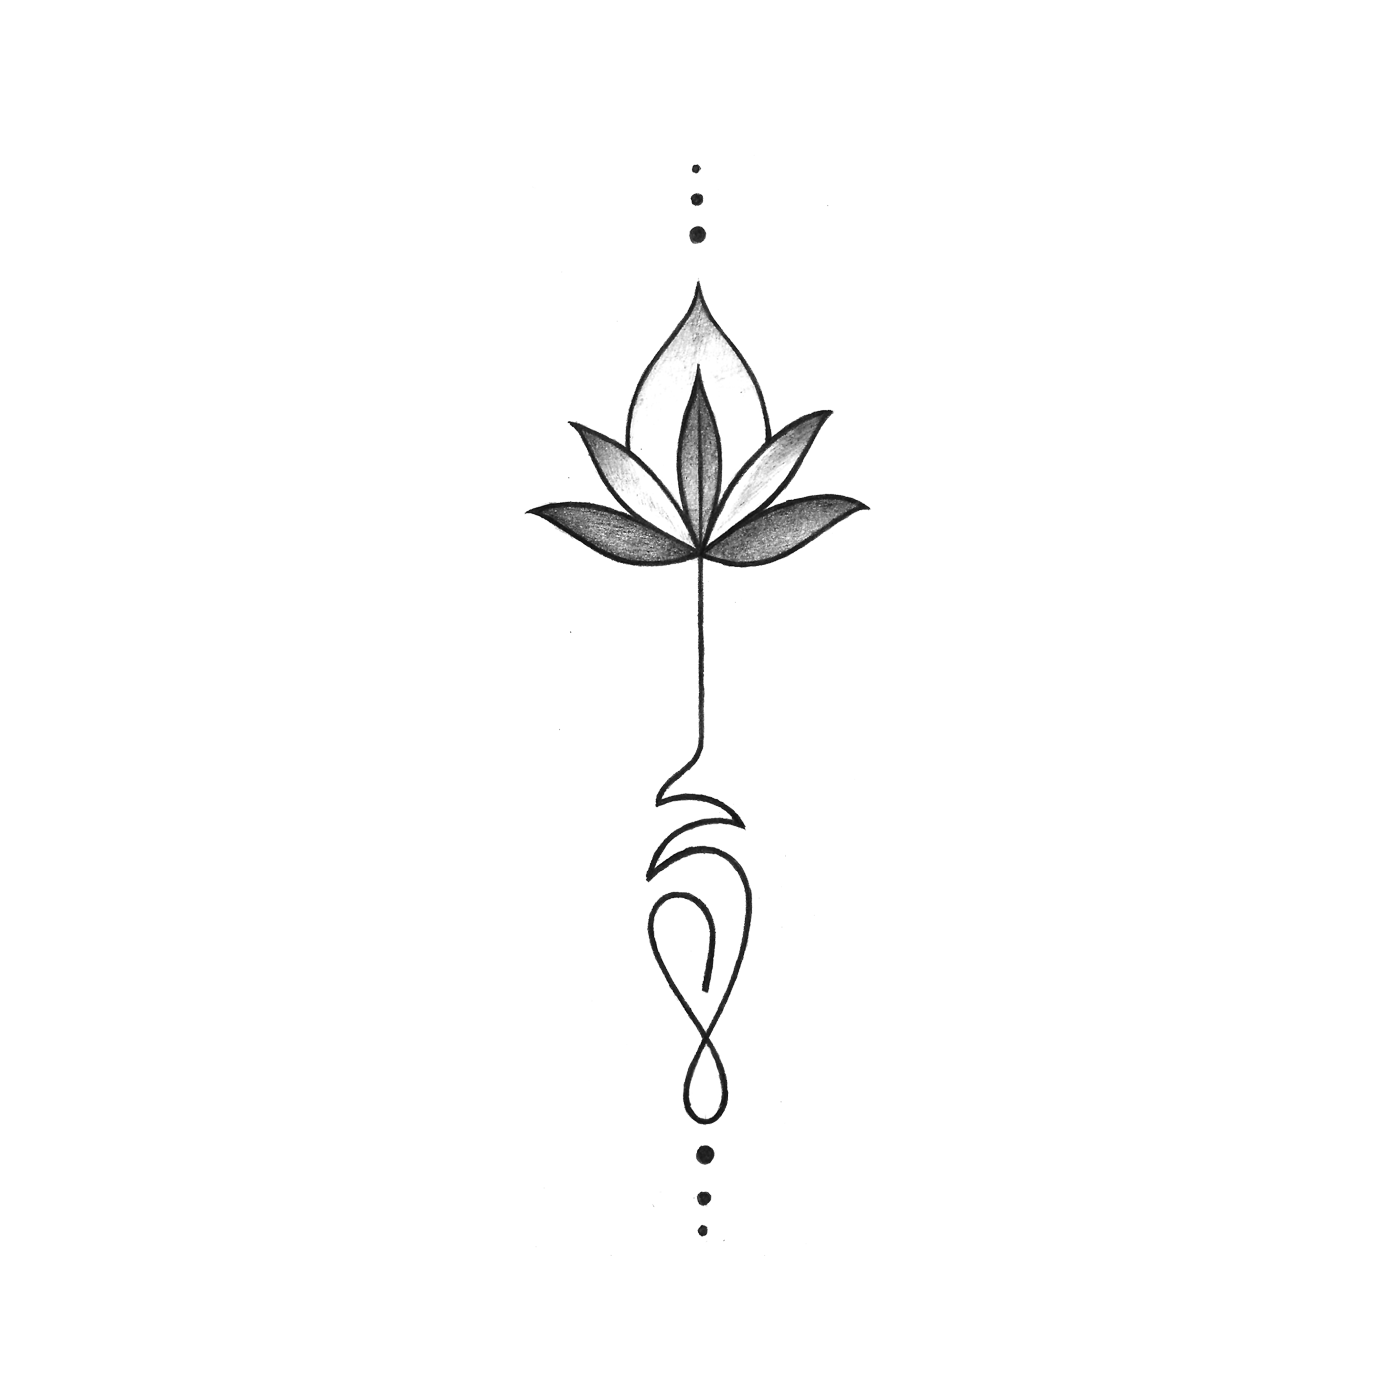 gray lotus temporary tattoo design tattoo 39 s tattoo. Black Bedroom Furniture Sets. Home Design Ideas